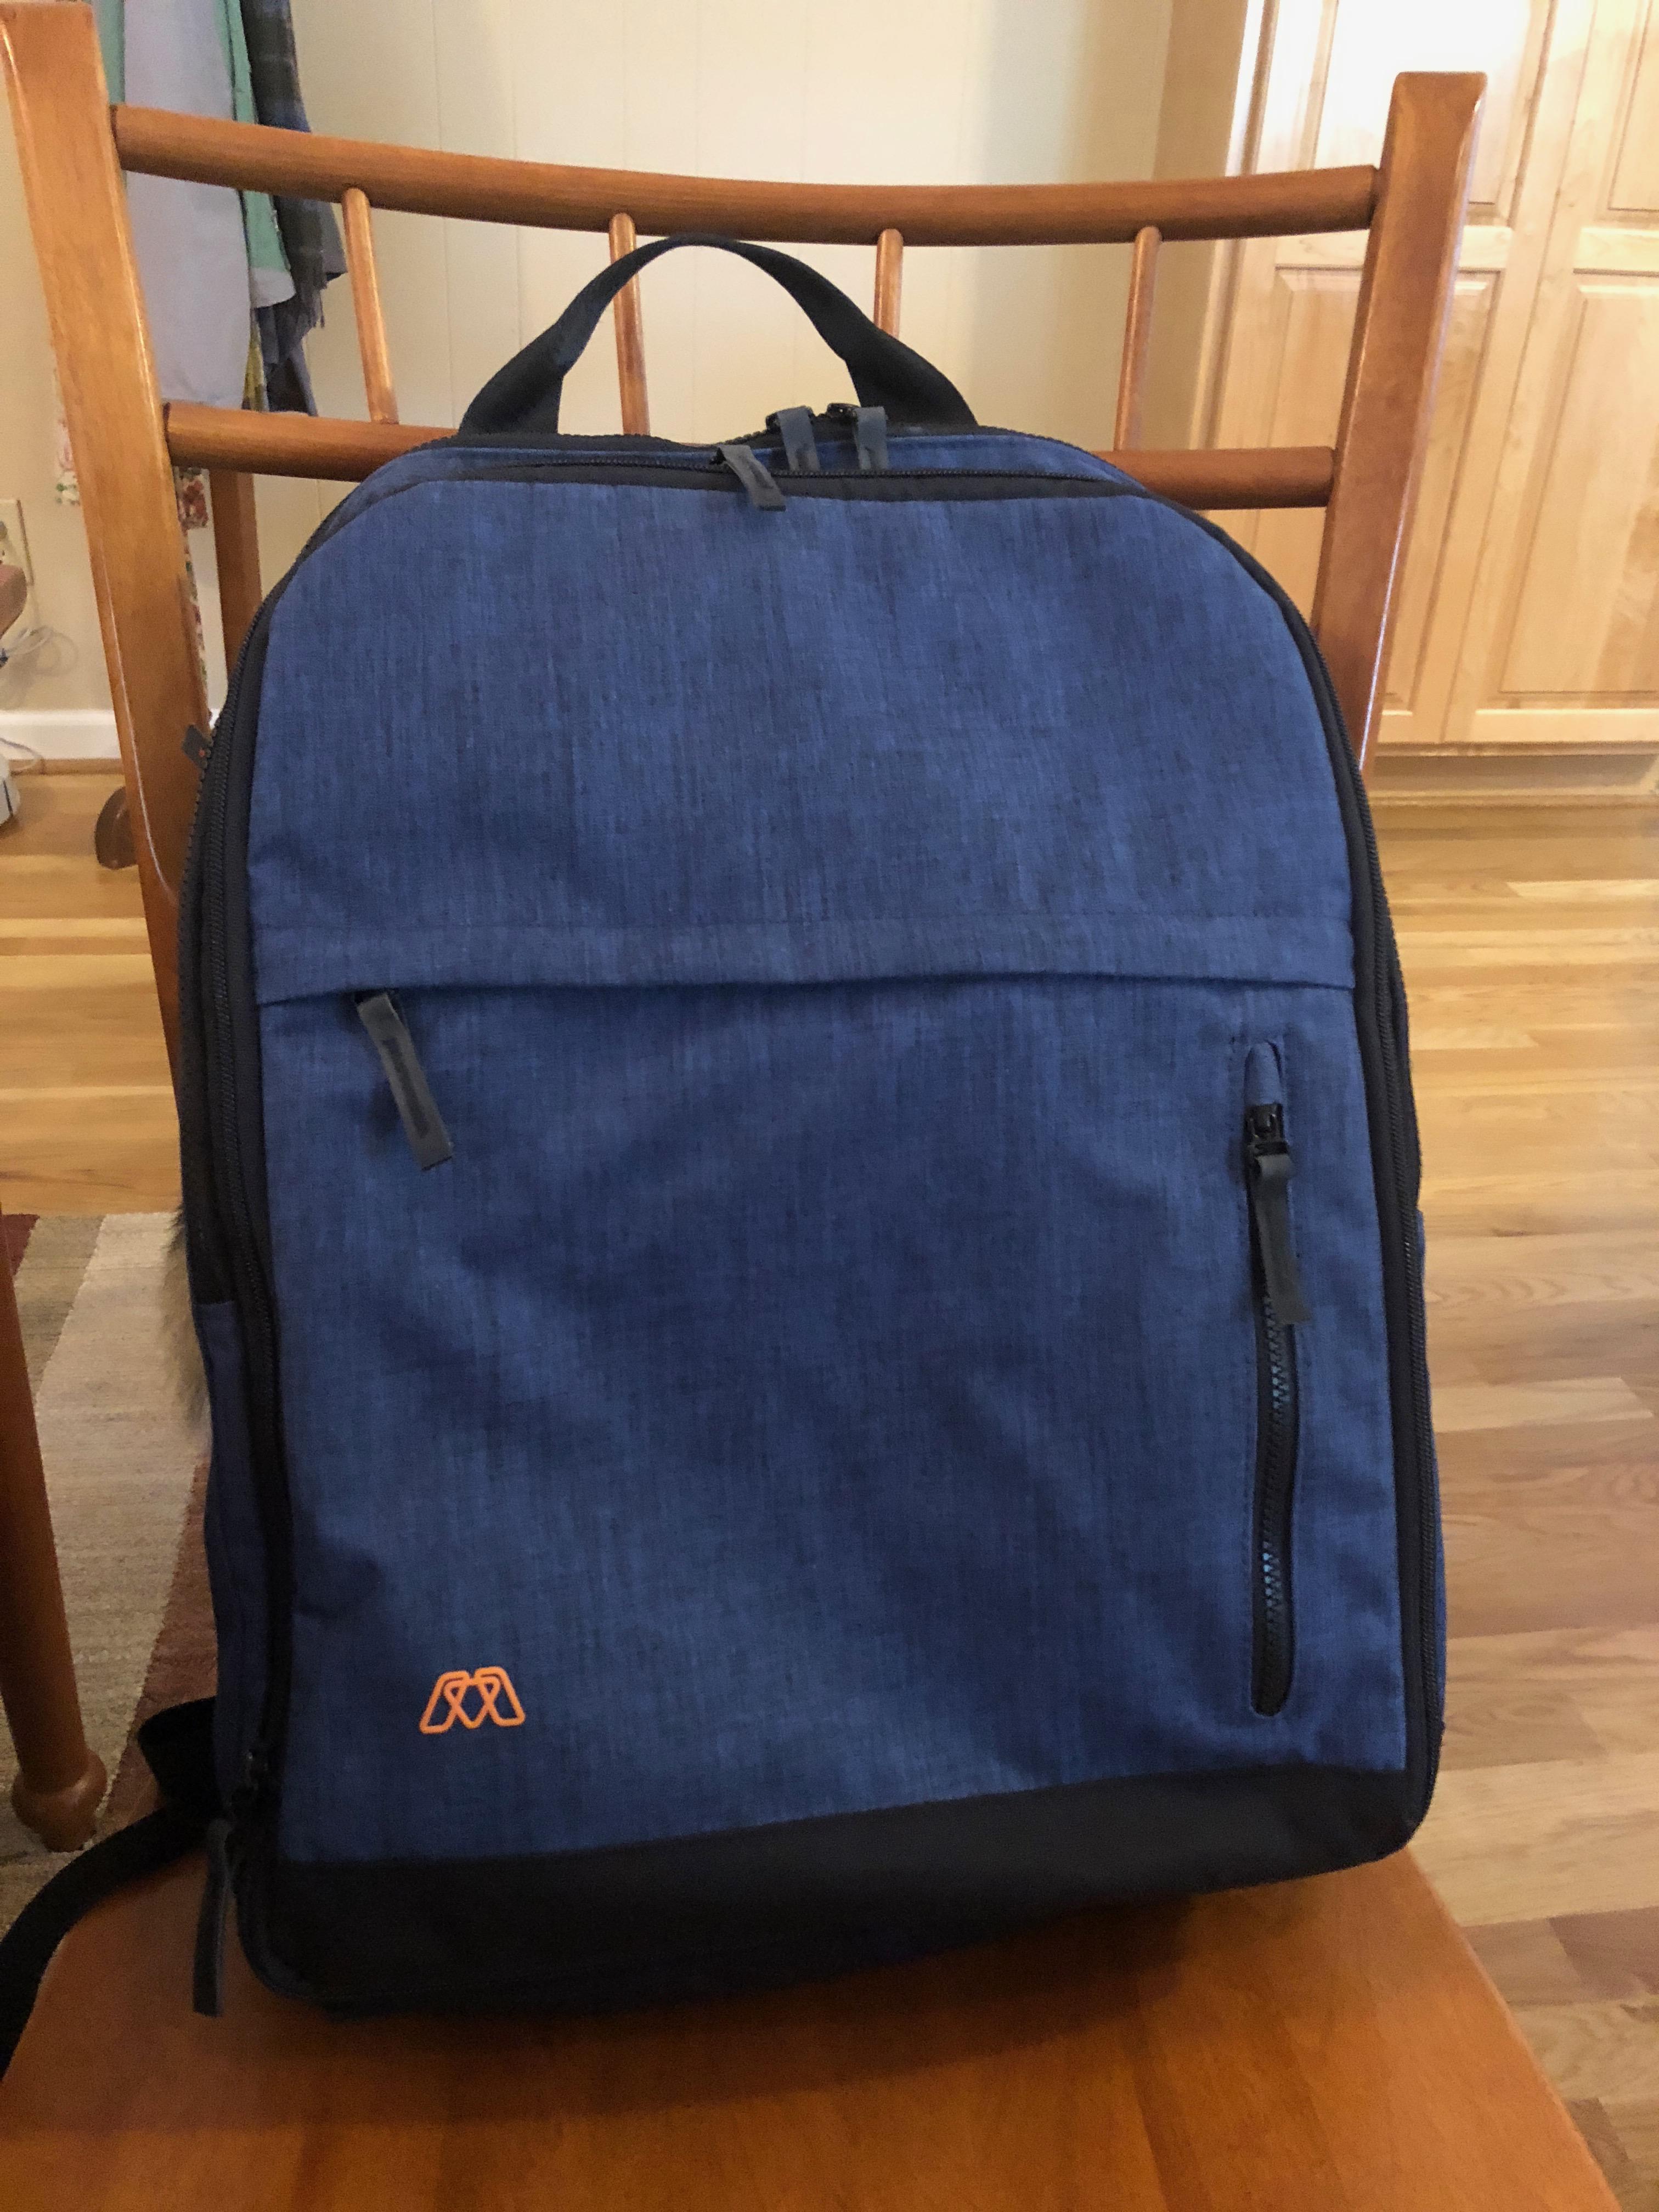 MOS Pack Grande backpack review – The Gadgeteer 7ba1254ed9009